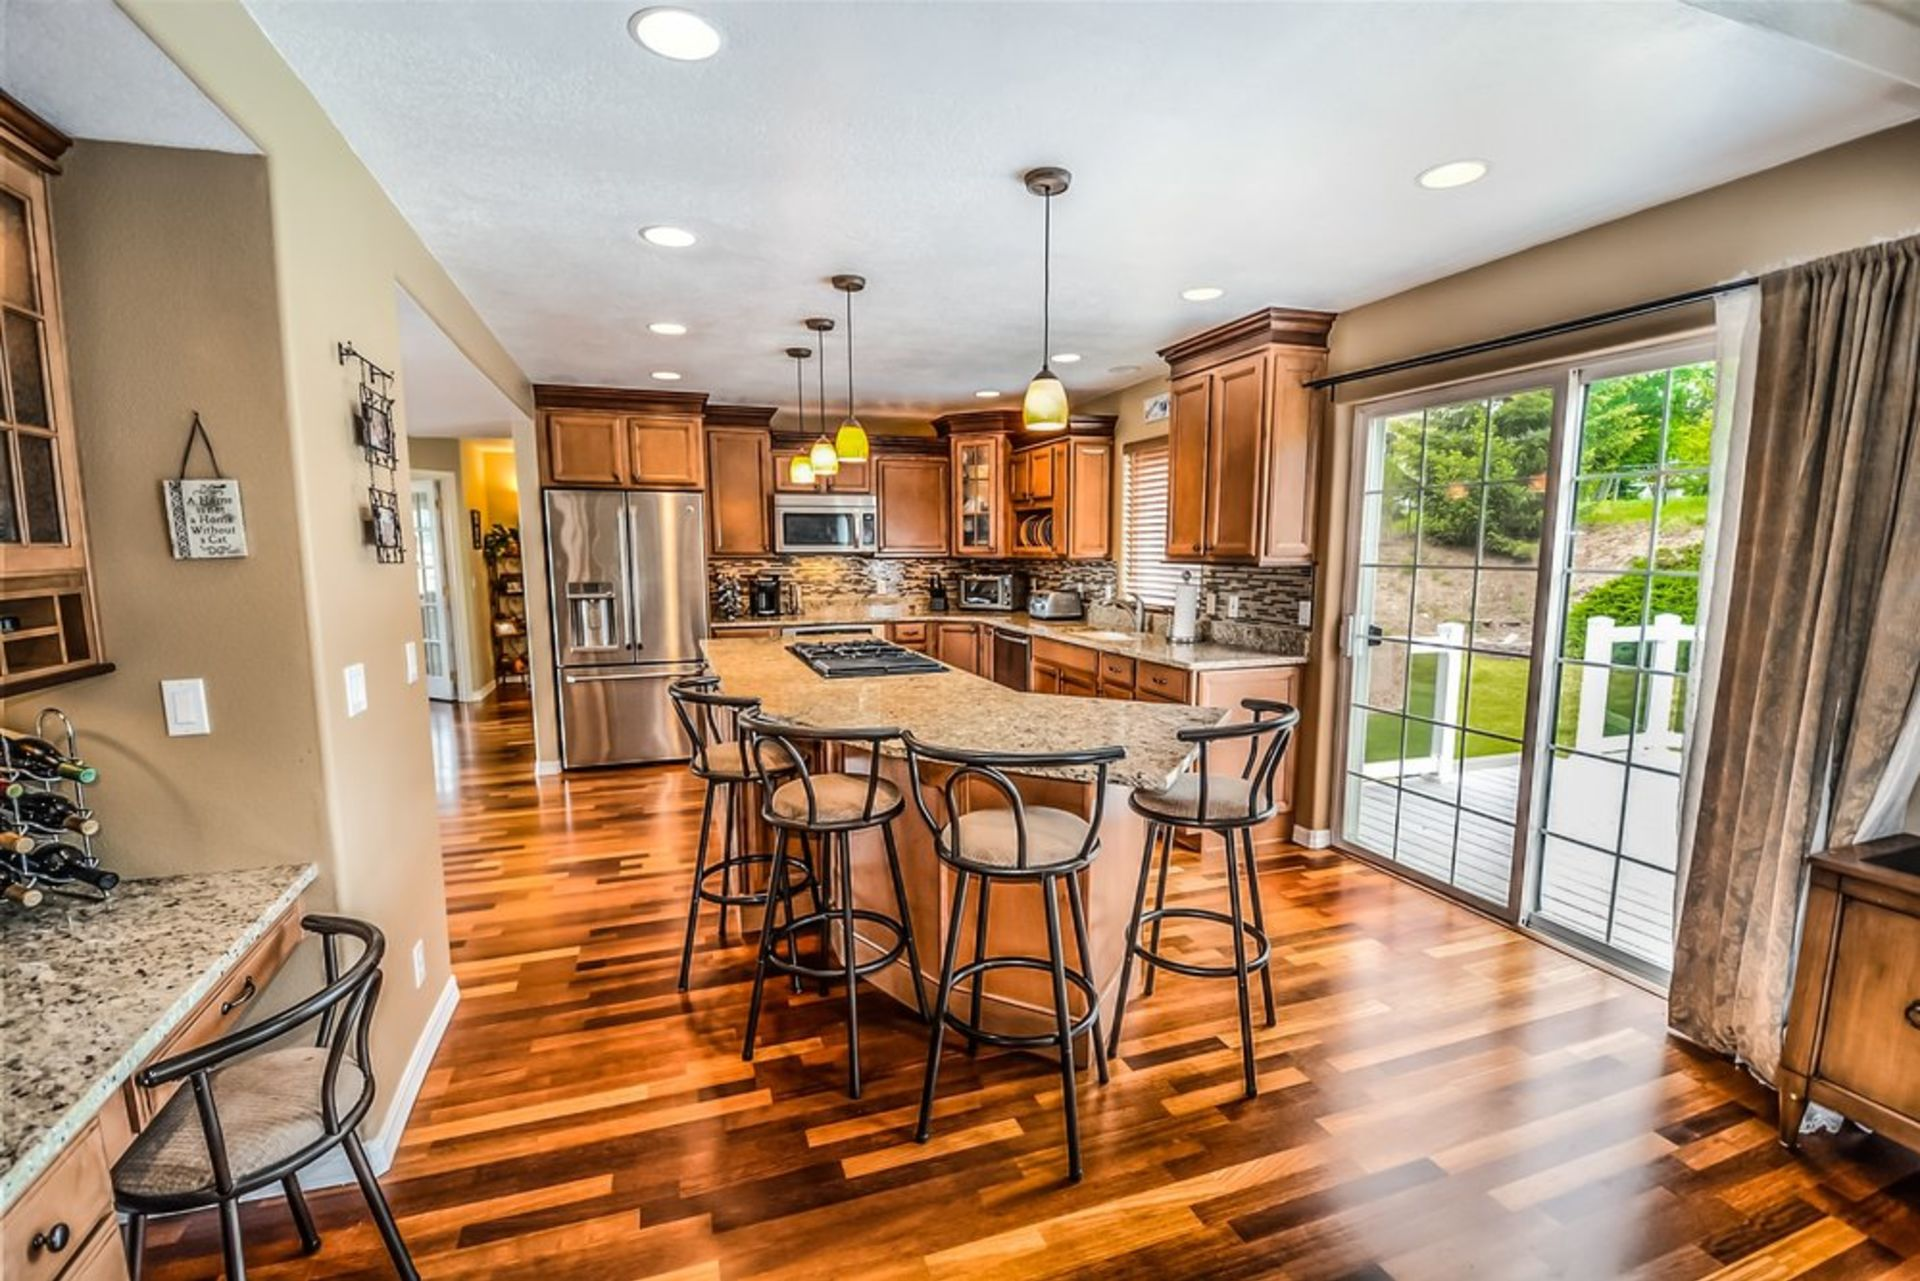 10 Homes Chores To Do Annually